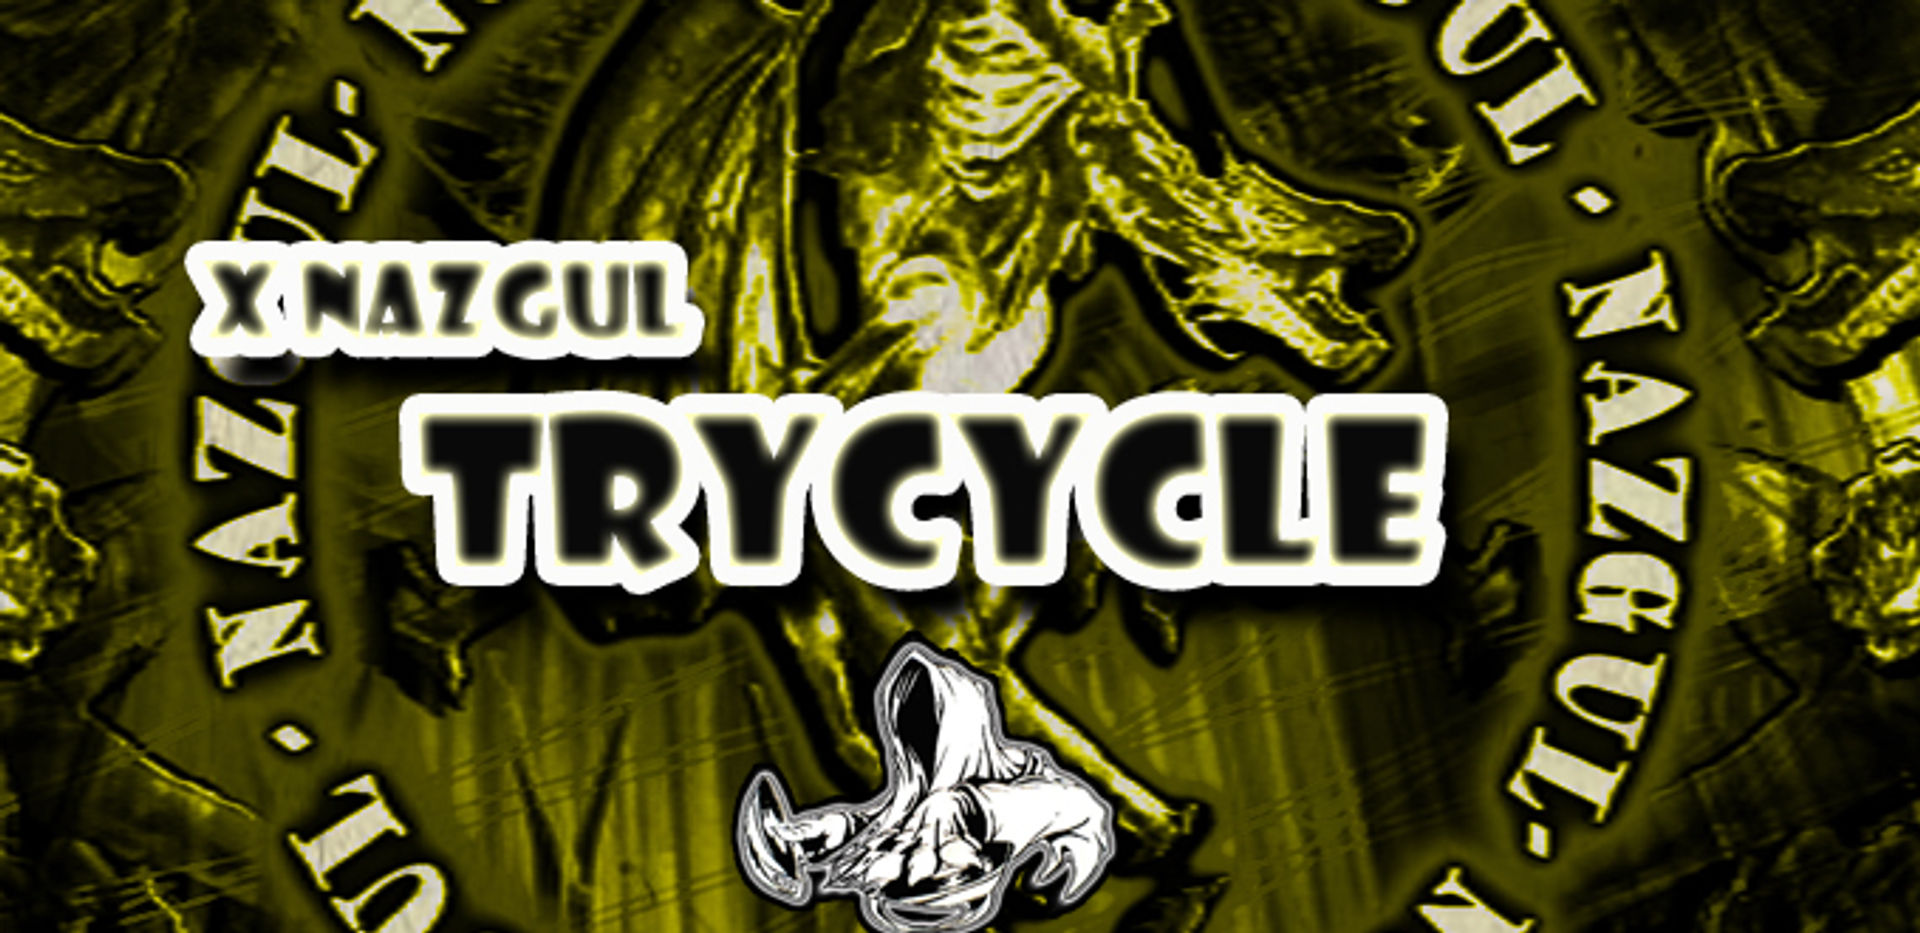 XNazgul - TryCycle